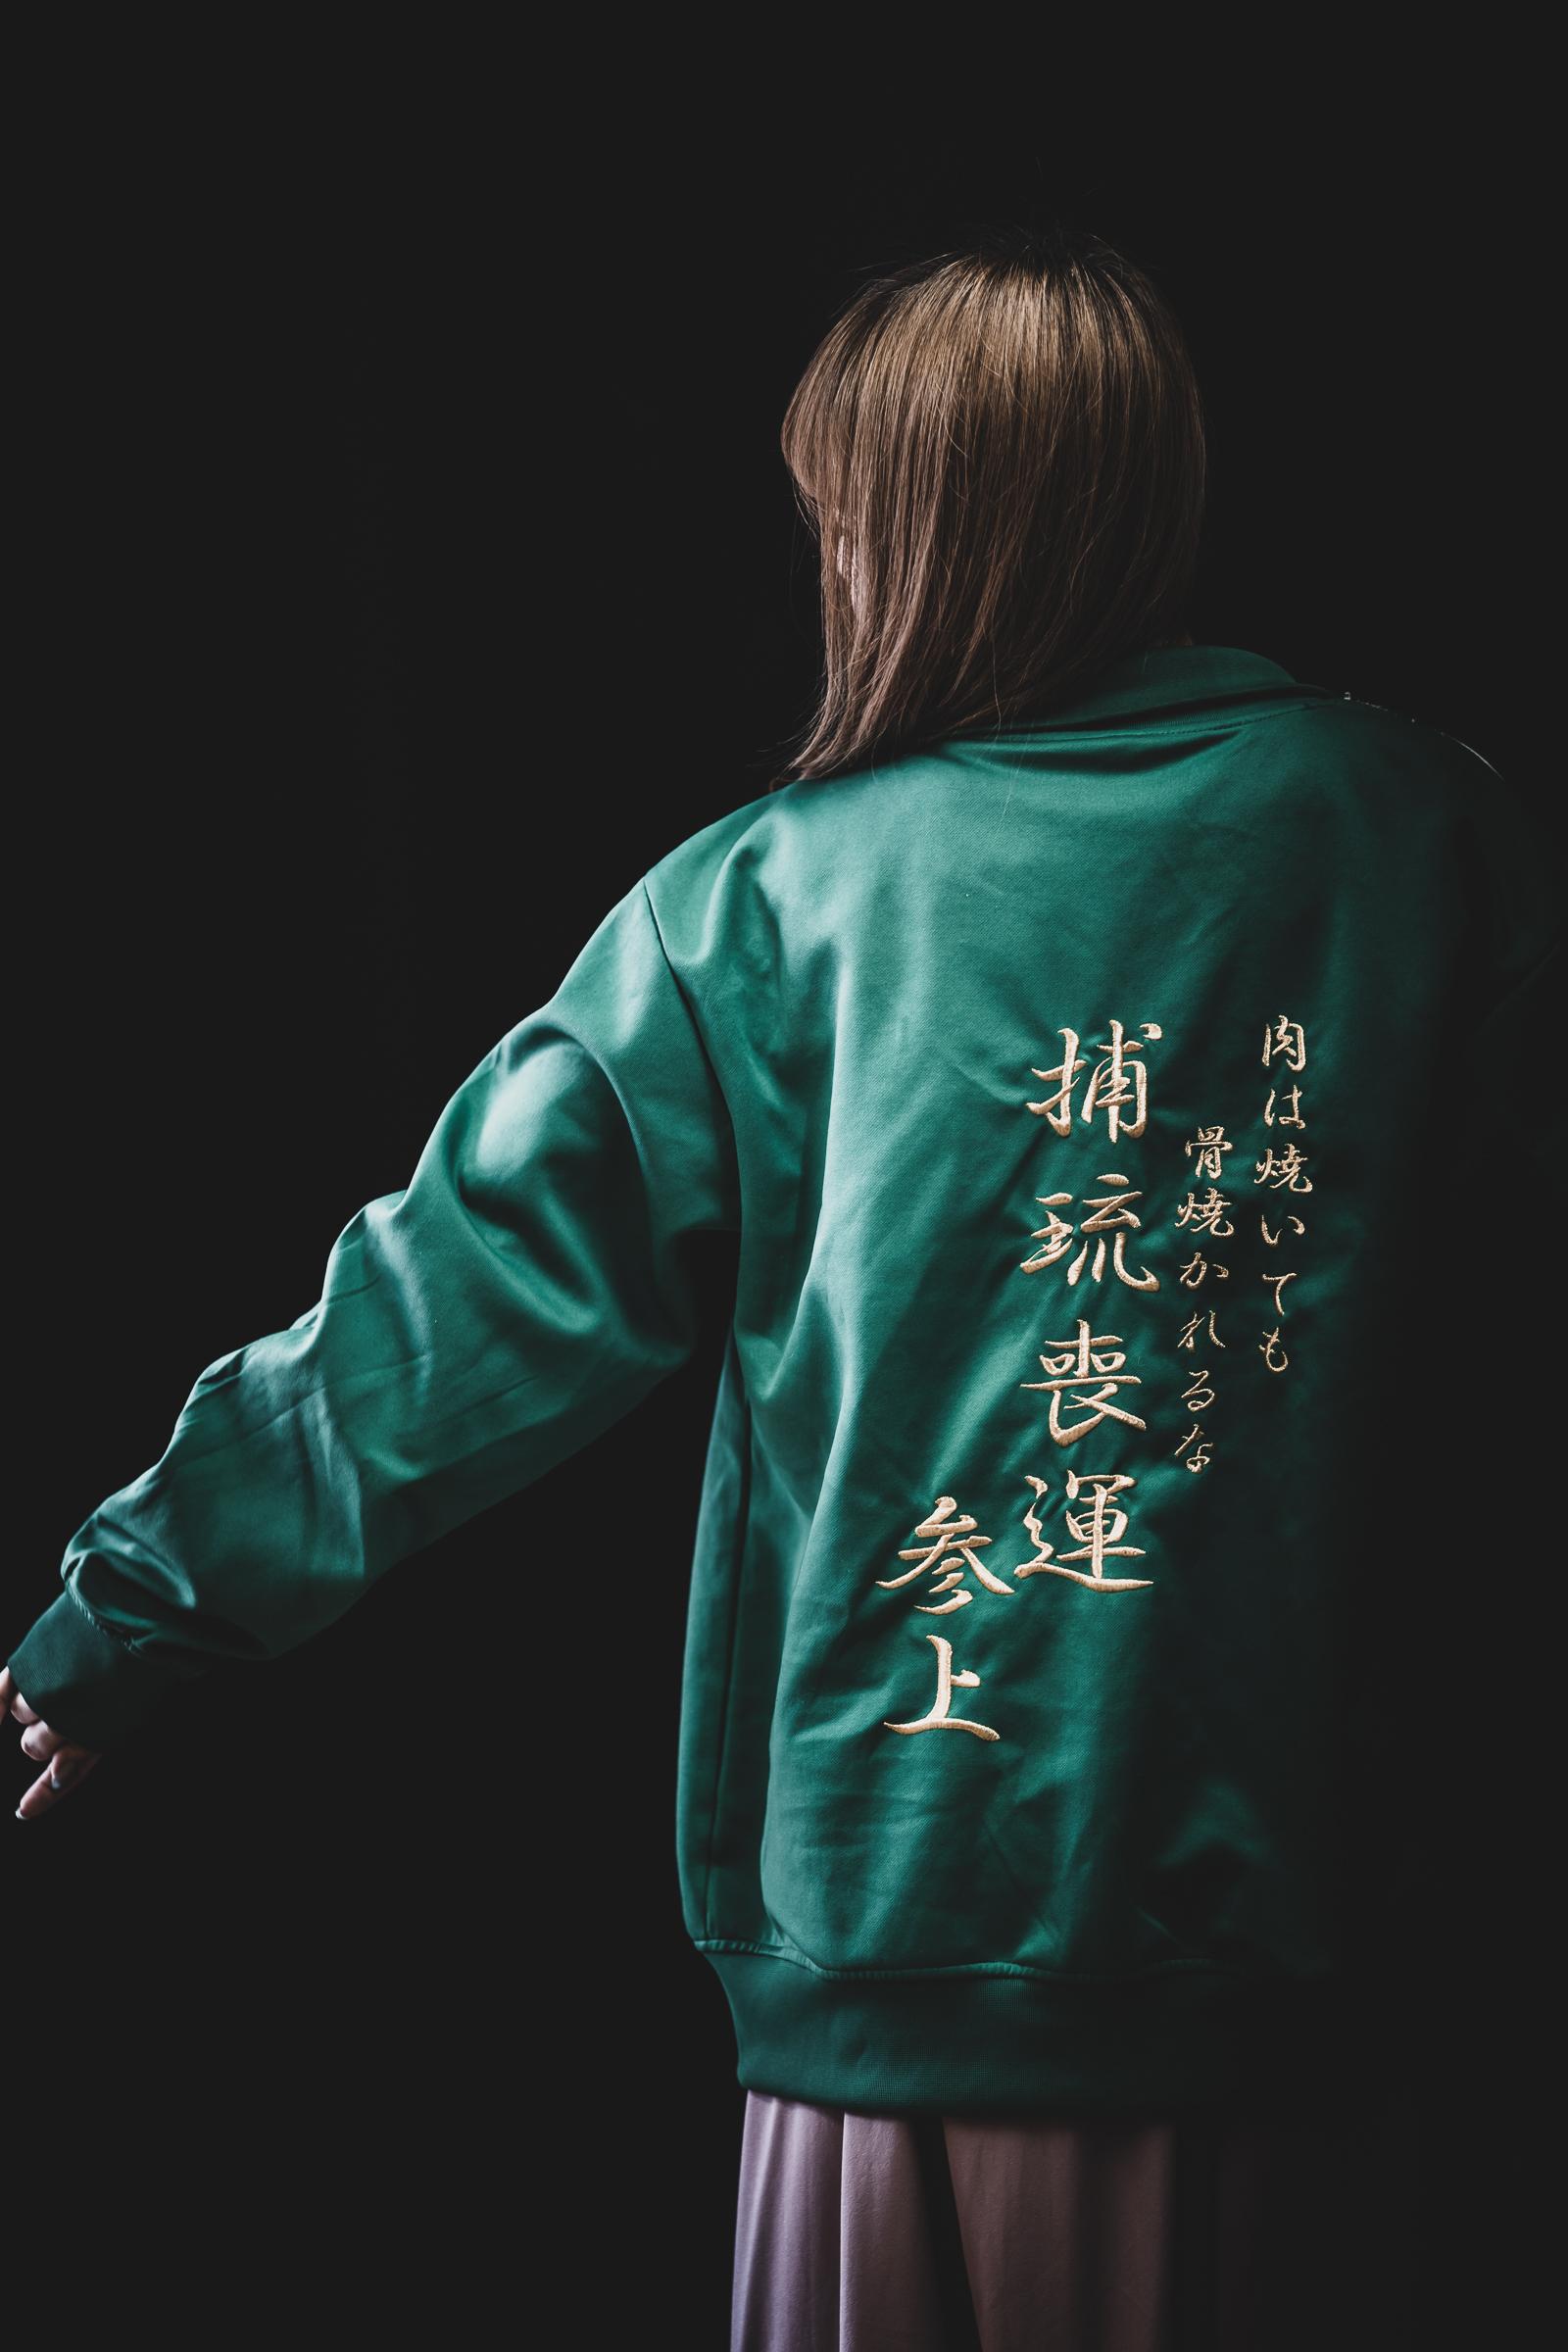 POPPING☆SMILE あすか ( 橋本明日香 ) | SMP 札幌モデルプロ 撮影会